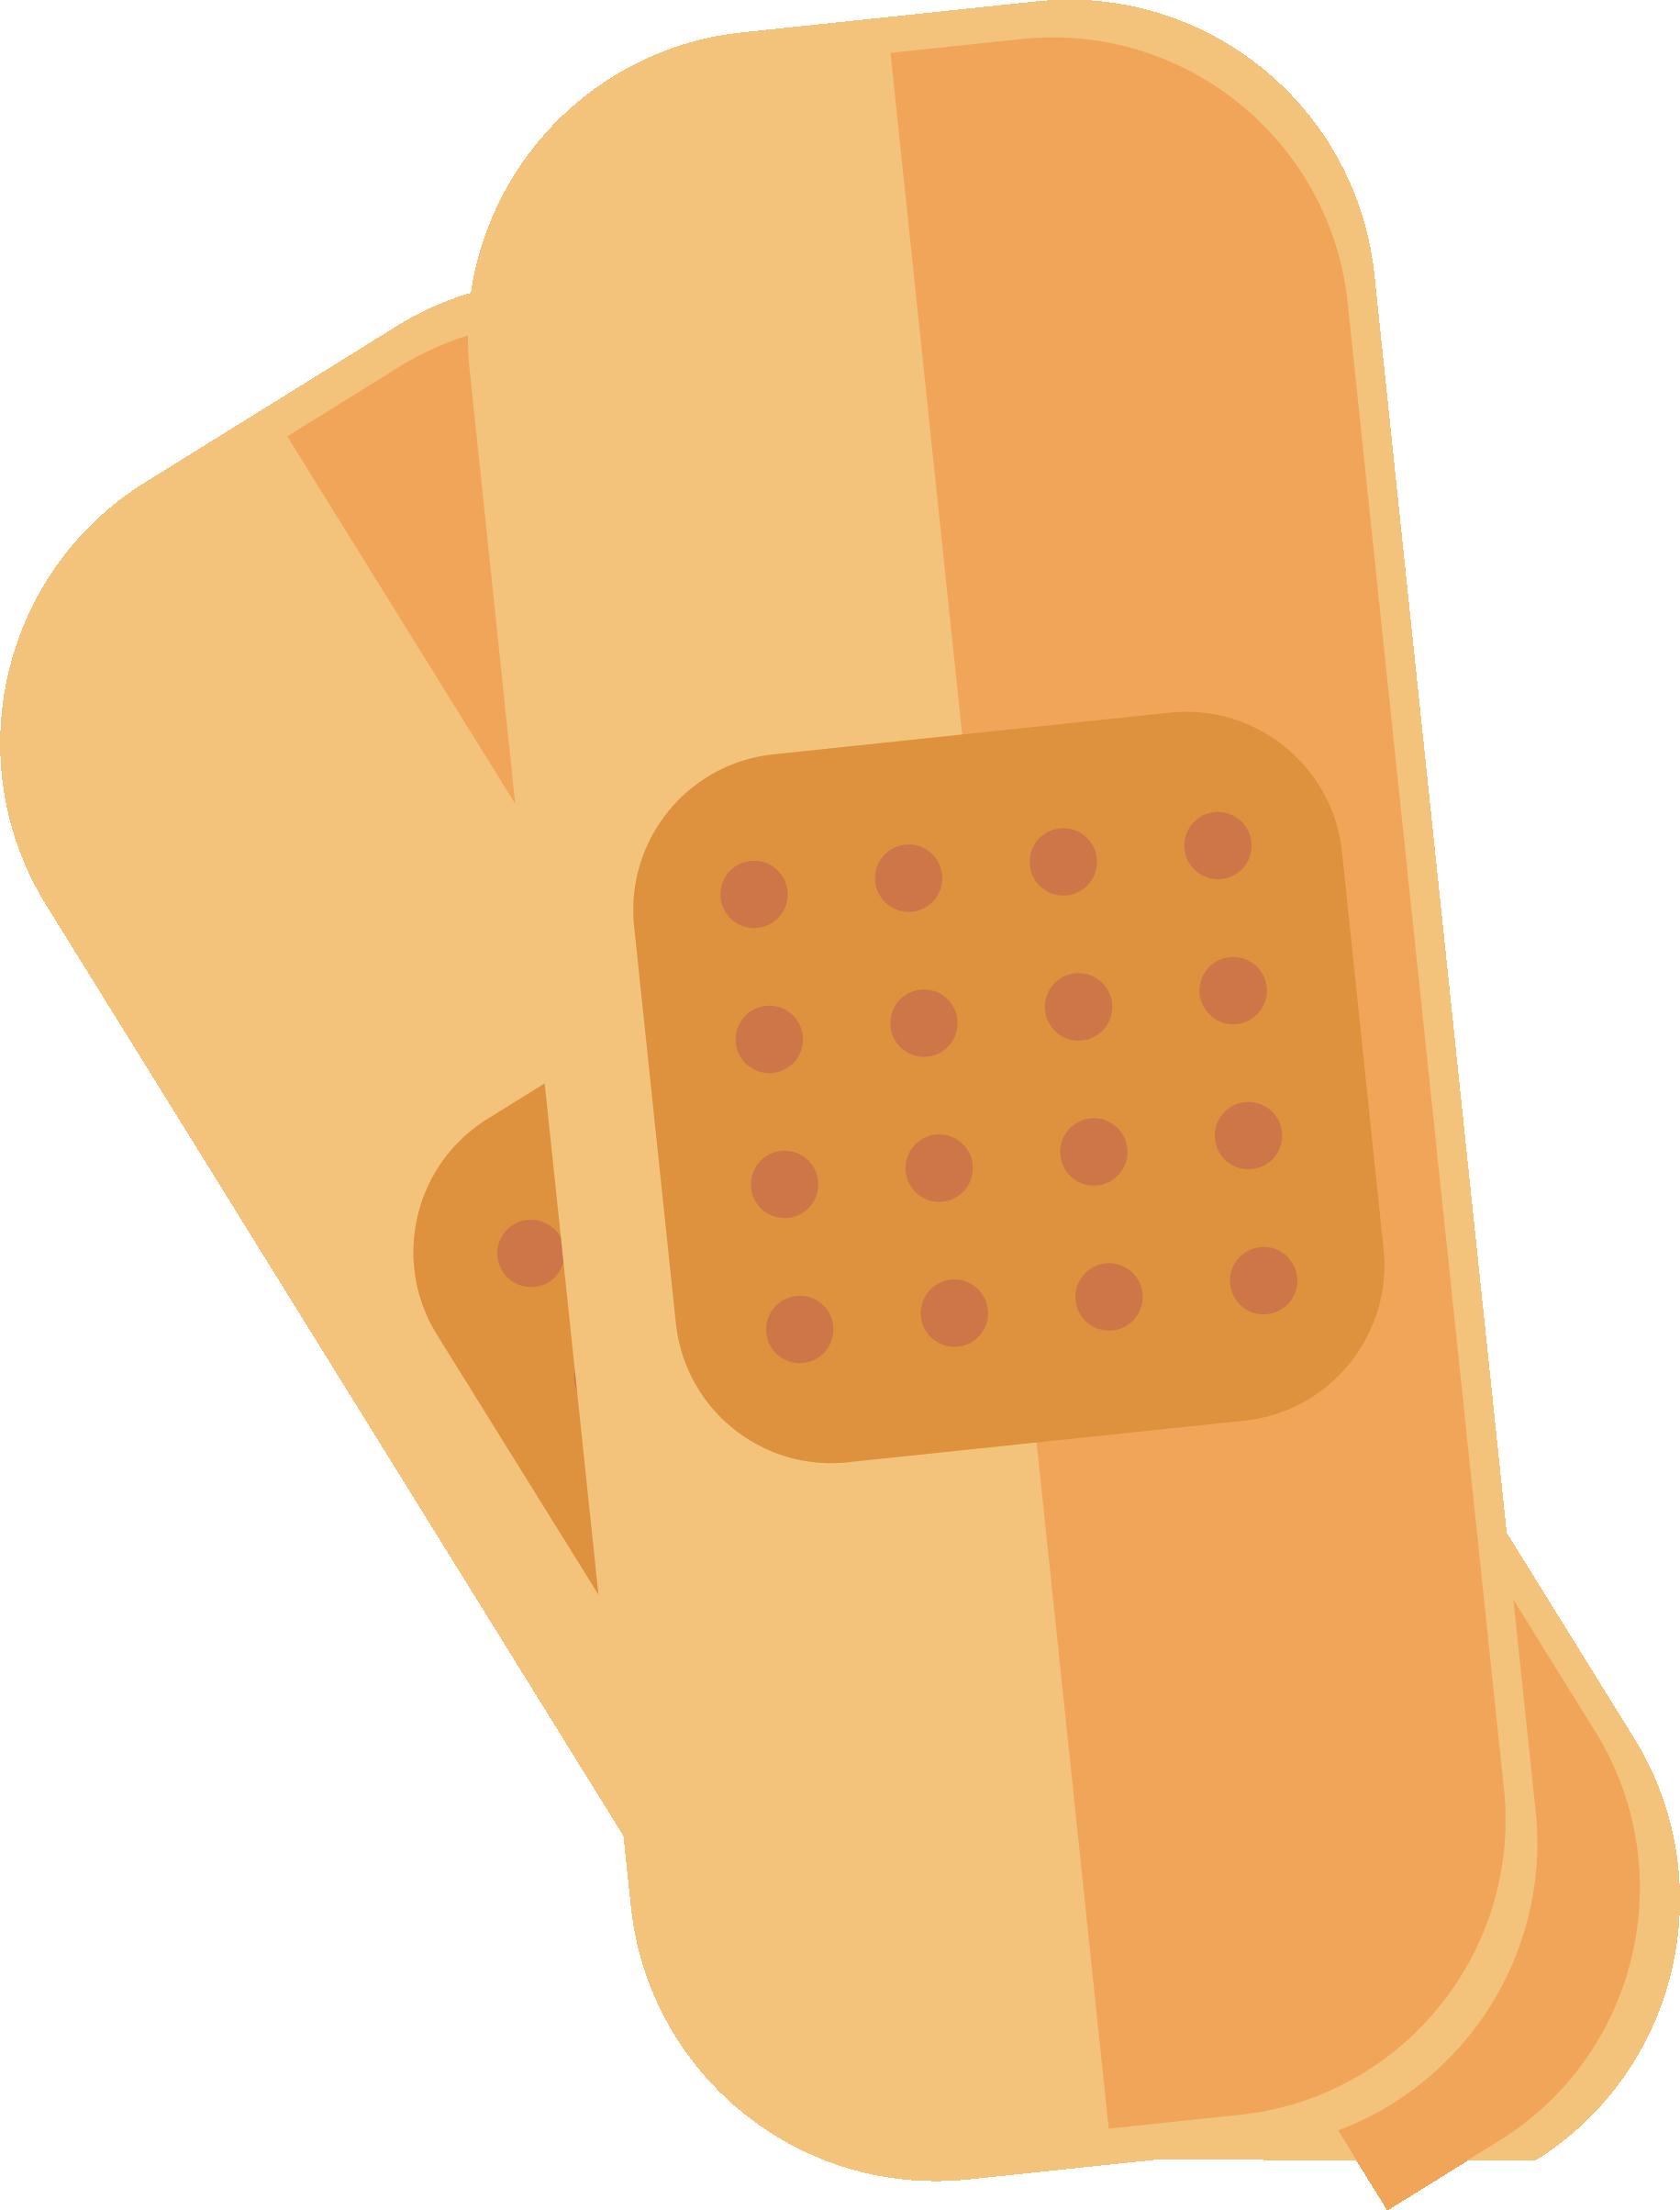 Gum clipart adhesive. Band aid bandage cartoon